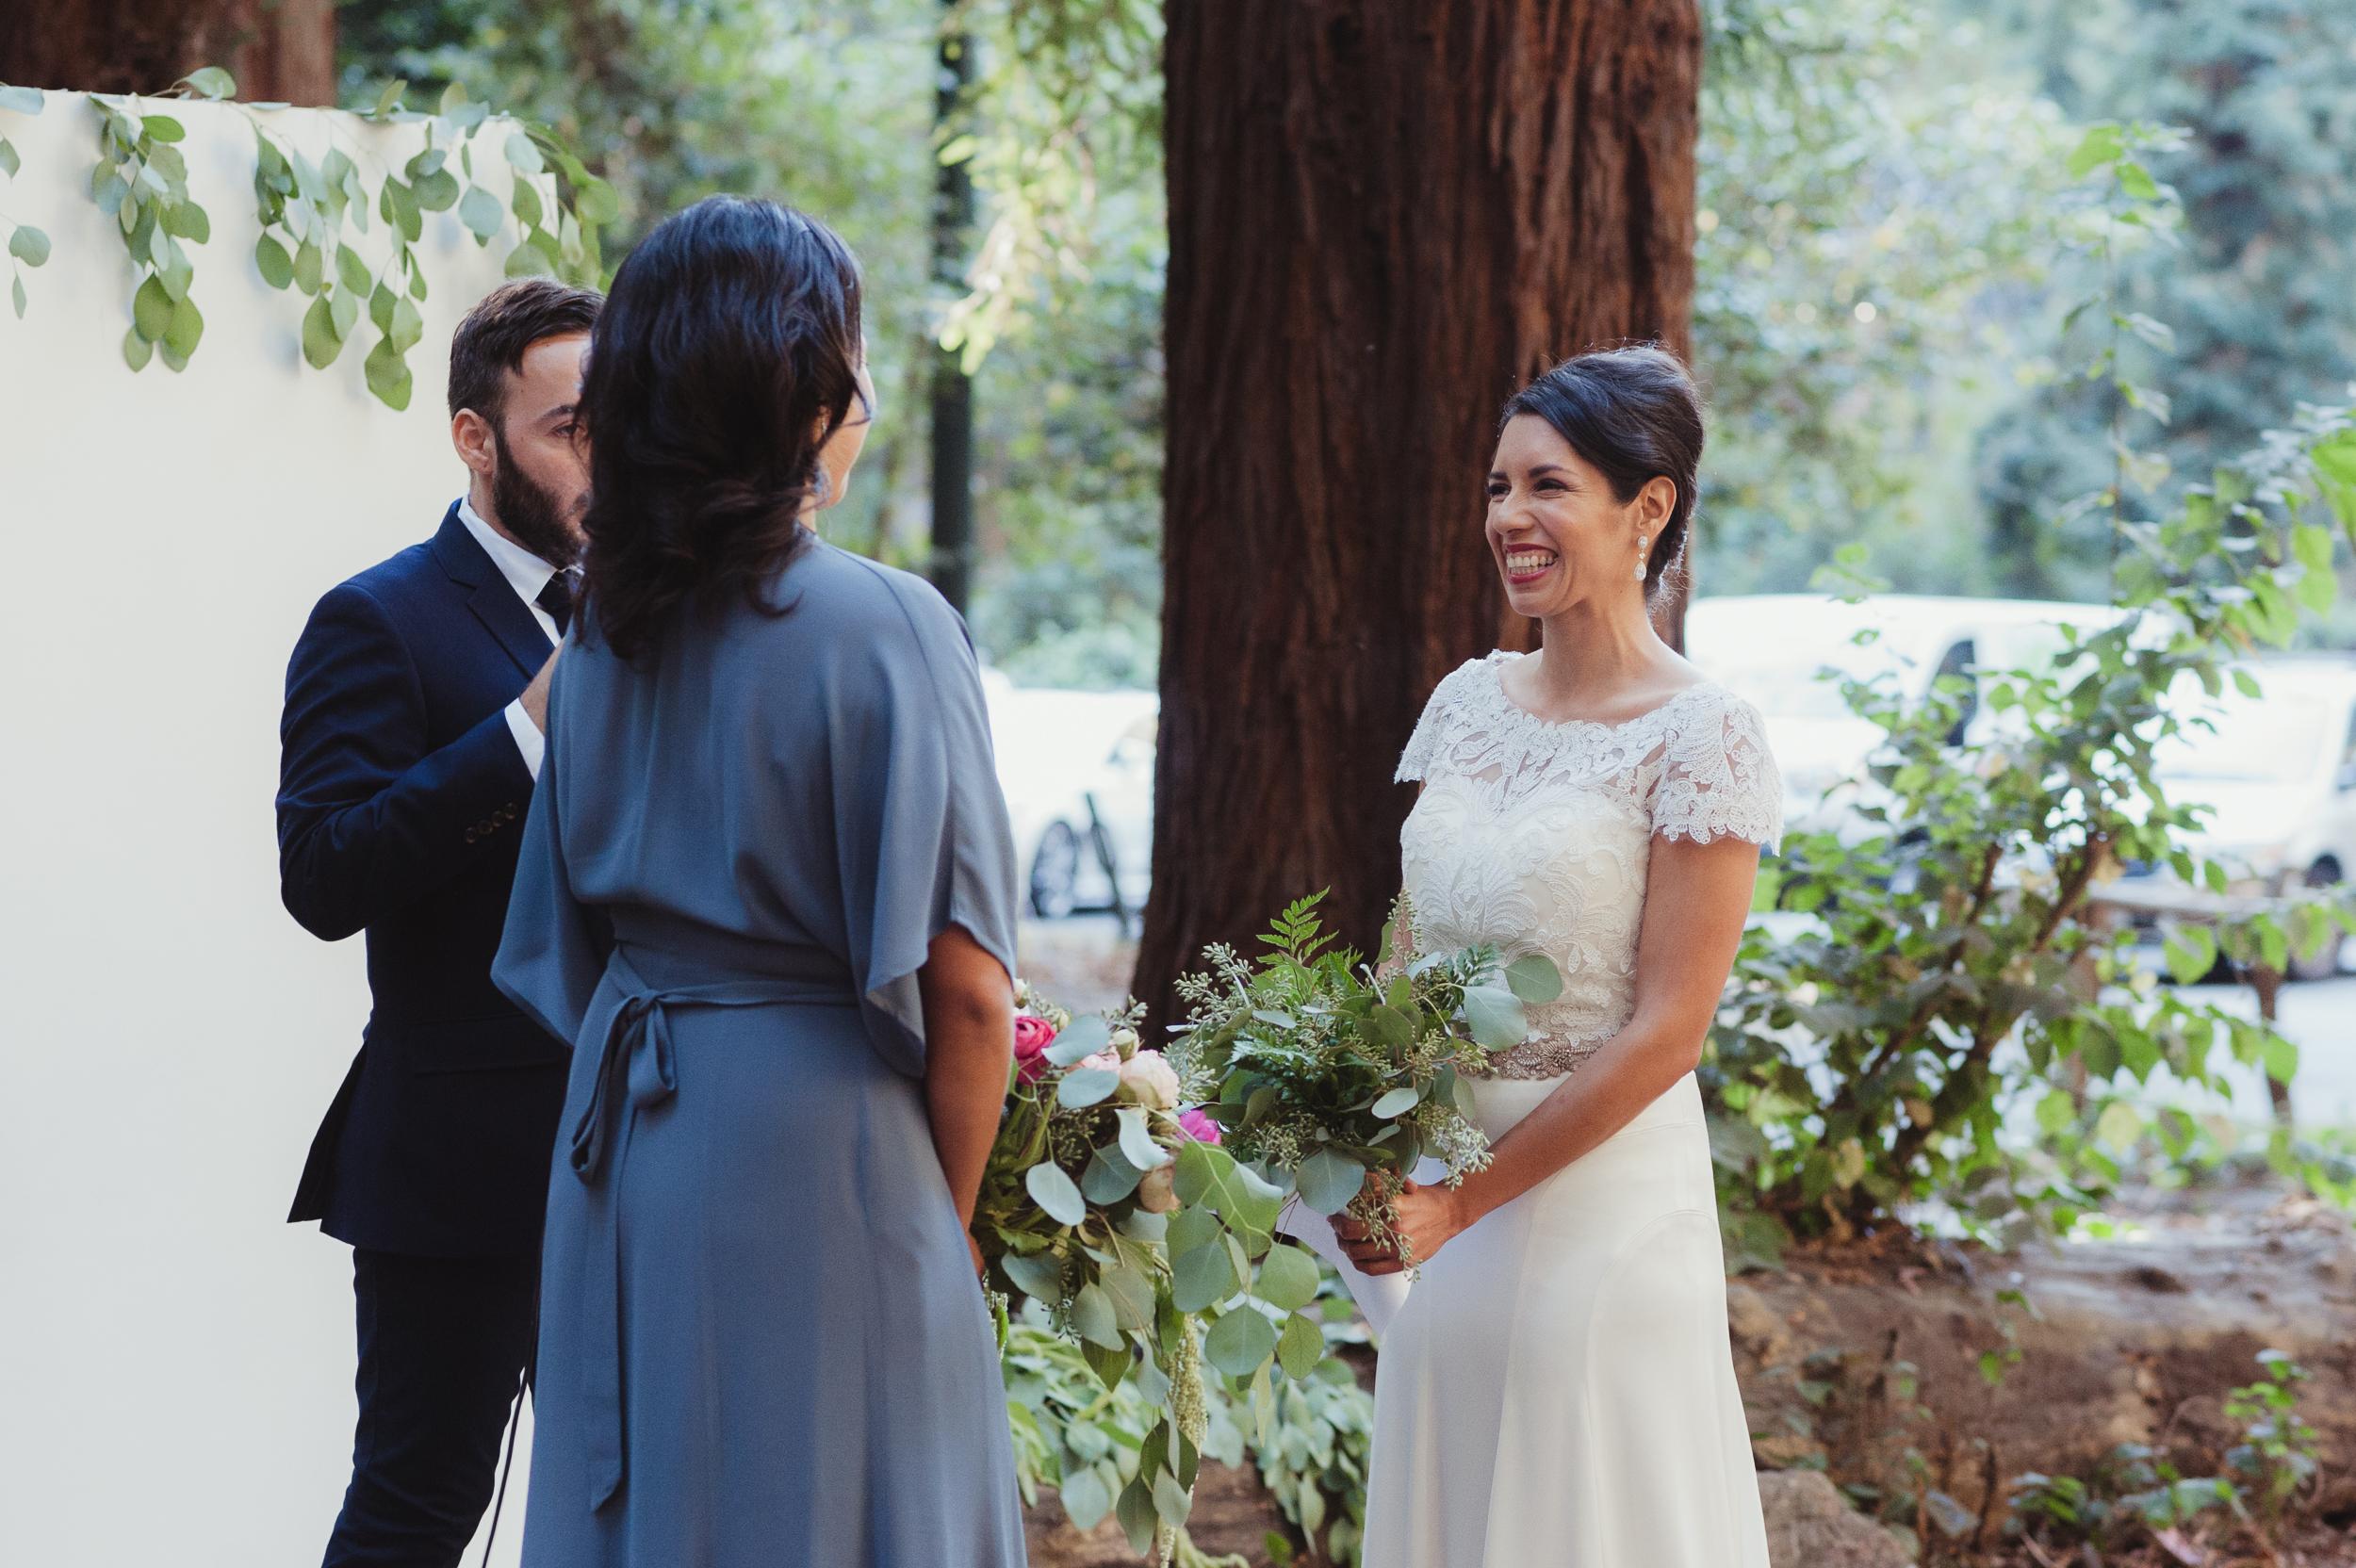 32san-francisco-stern-grove-wedding-photographer-vivianchen-233.jpg